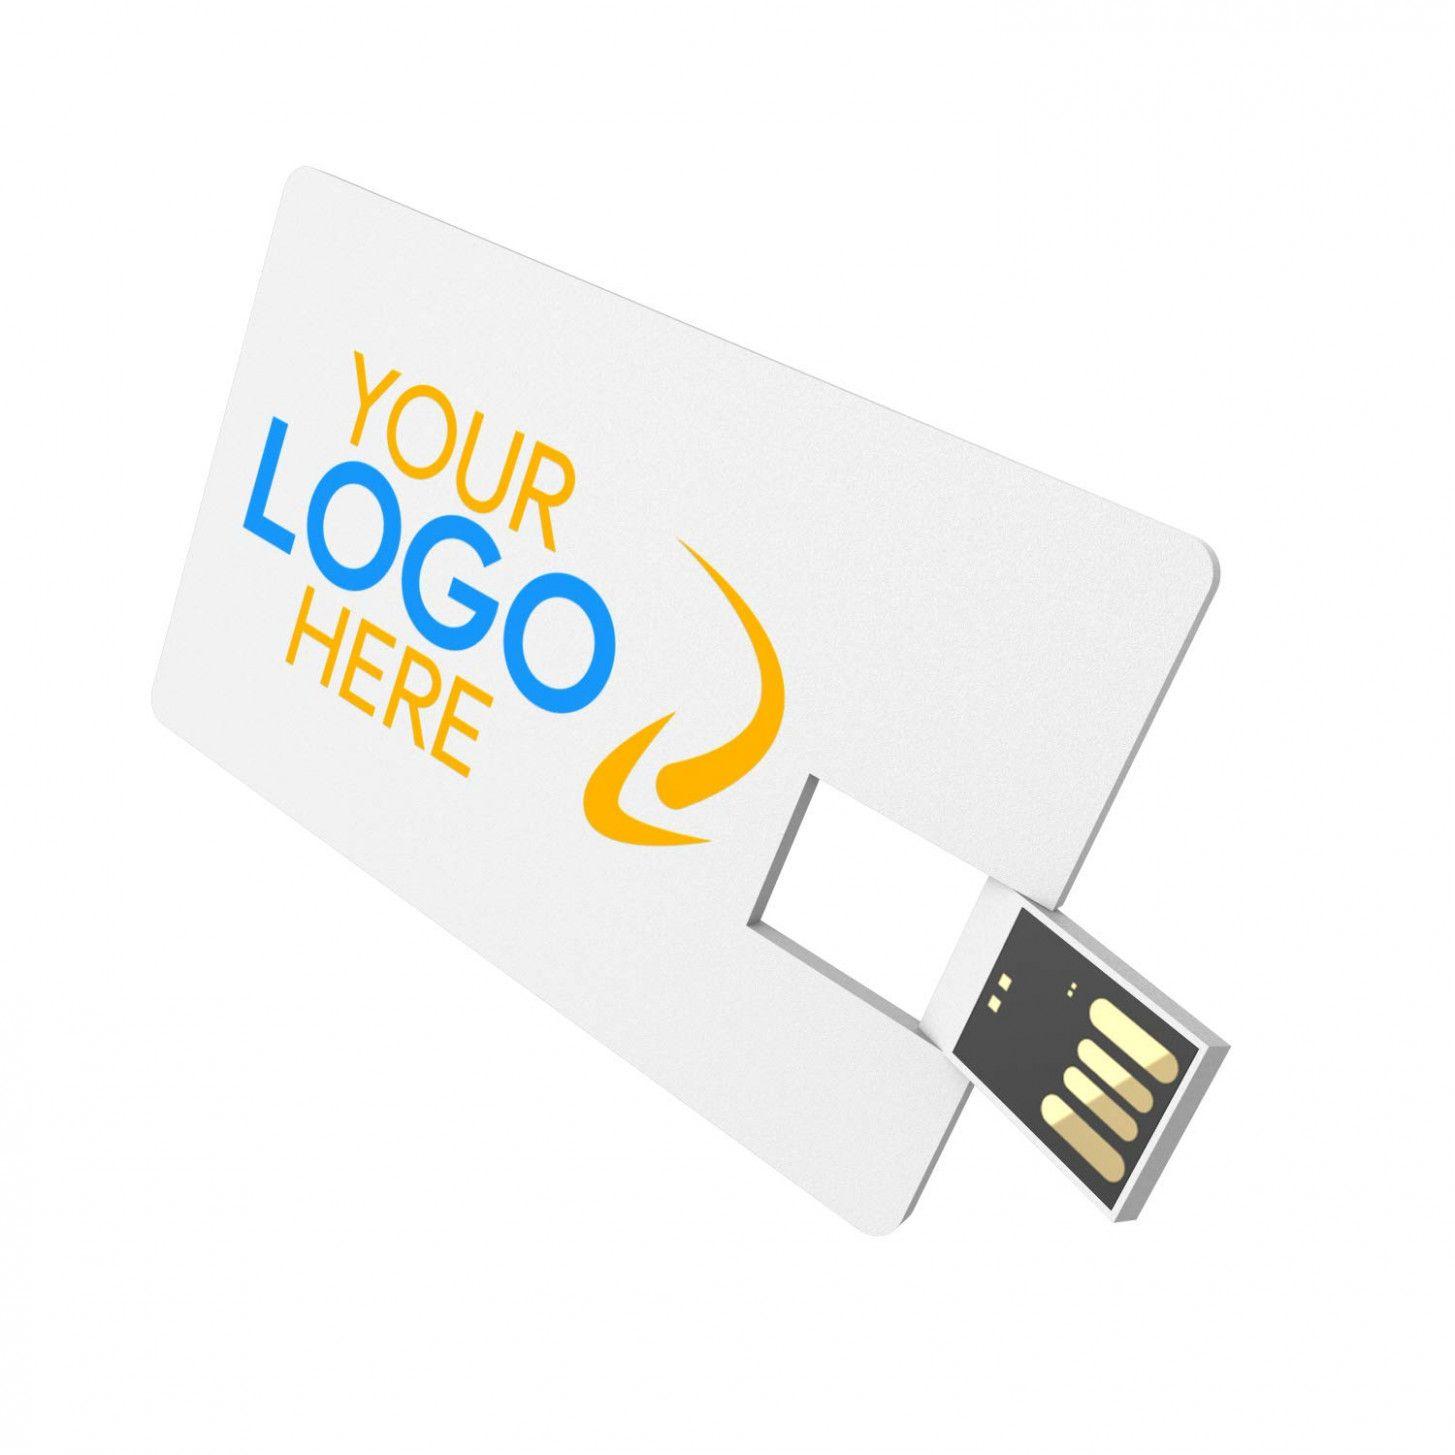 Business Card Usb Flash Drive Usb Business Cards Metal Business Cards Usb Flash Drive